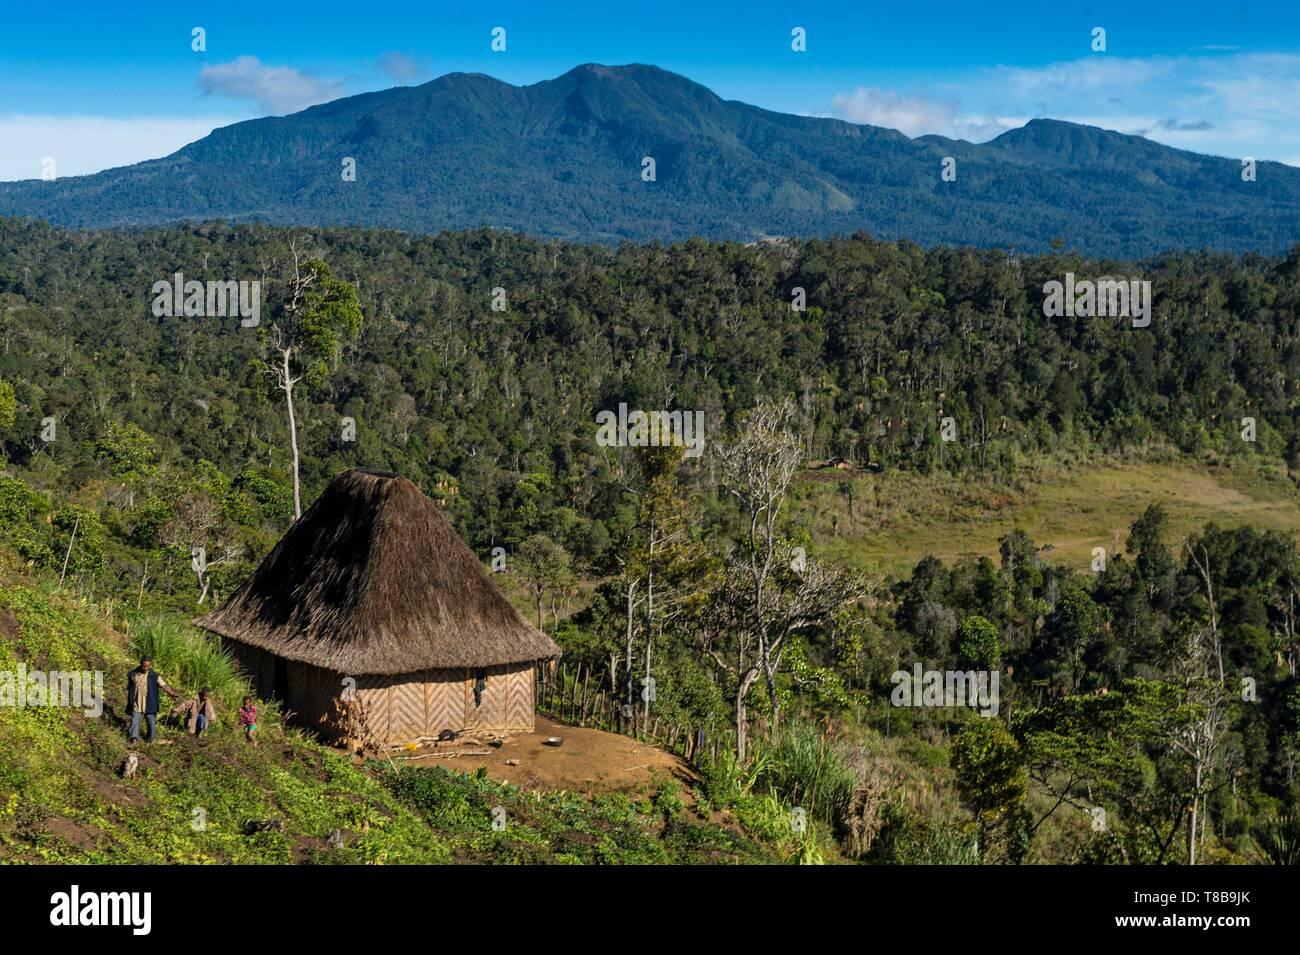 Papua New Guinea, Hela Province, Hulis tribe, Ambua region Stock Photo